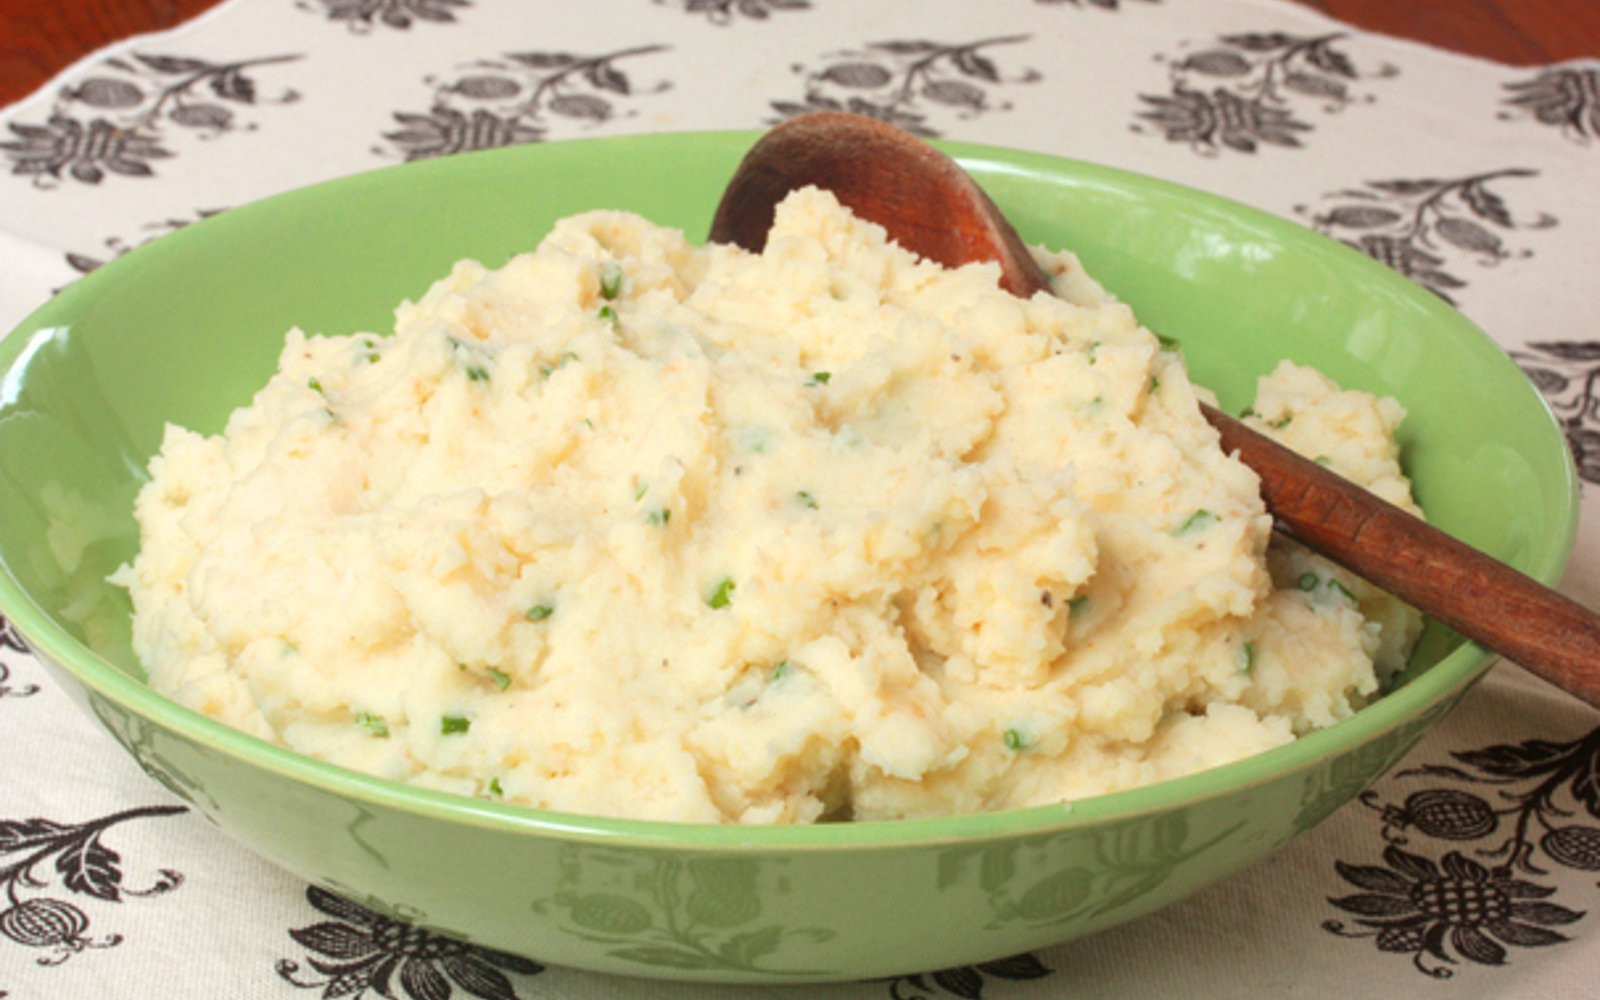 Healthy Mashed Potatoes Recipe  Potato and Celery Root Mash [Vegan] e Green Planet e